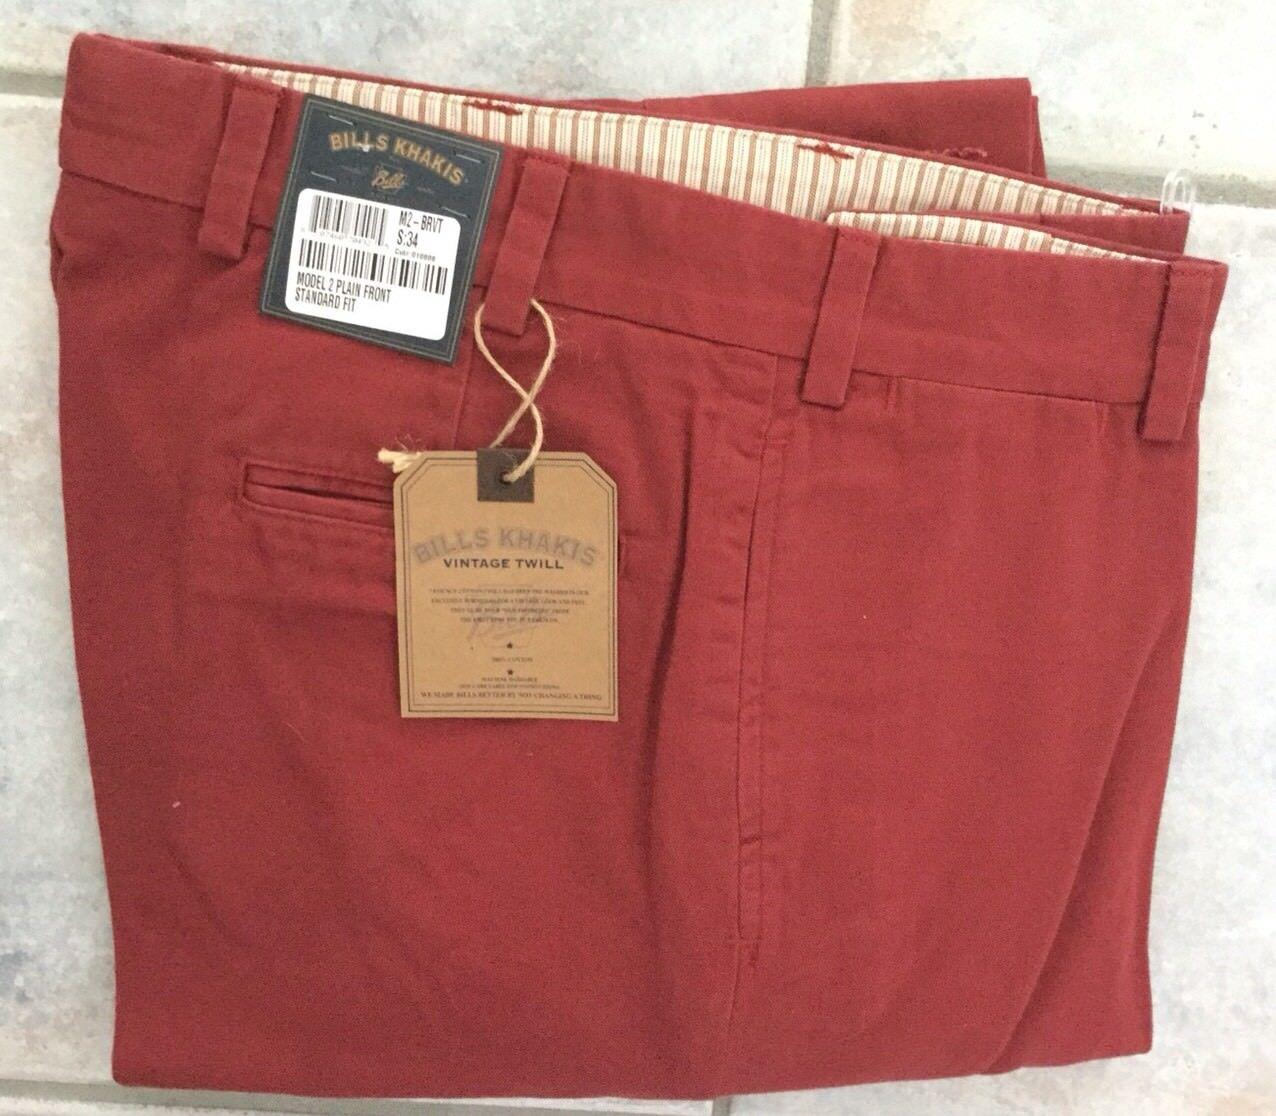 BRAND NEW  Bills khakis M2-BRVT Men's Size 35 Burnt Red Vintage Twill MSRP